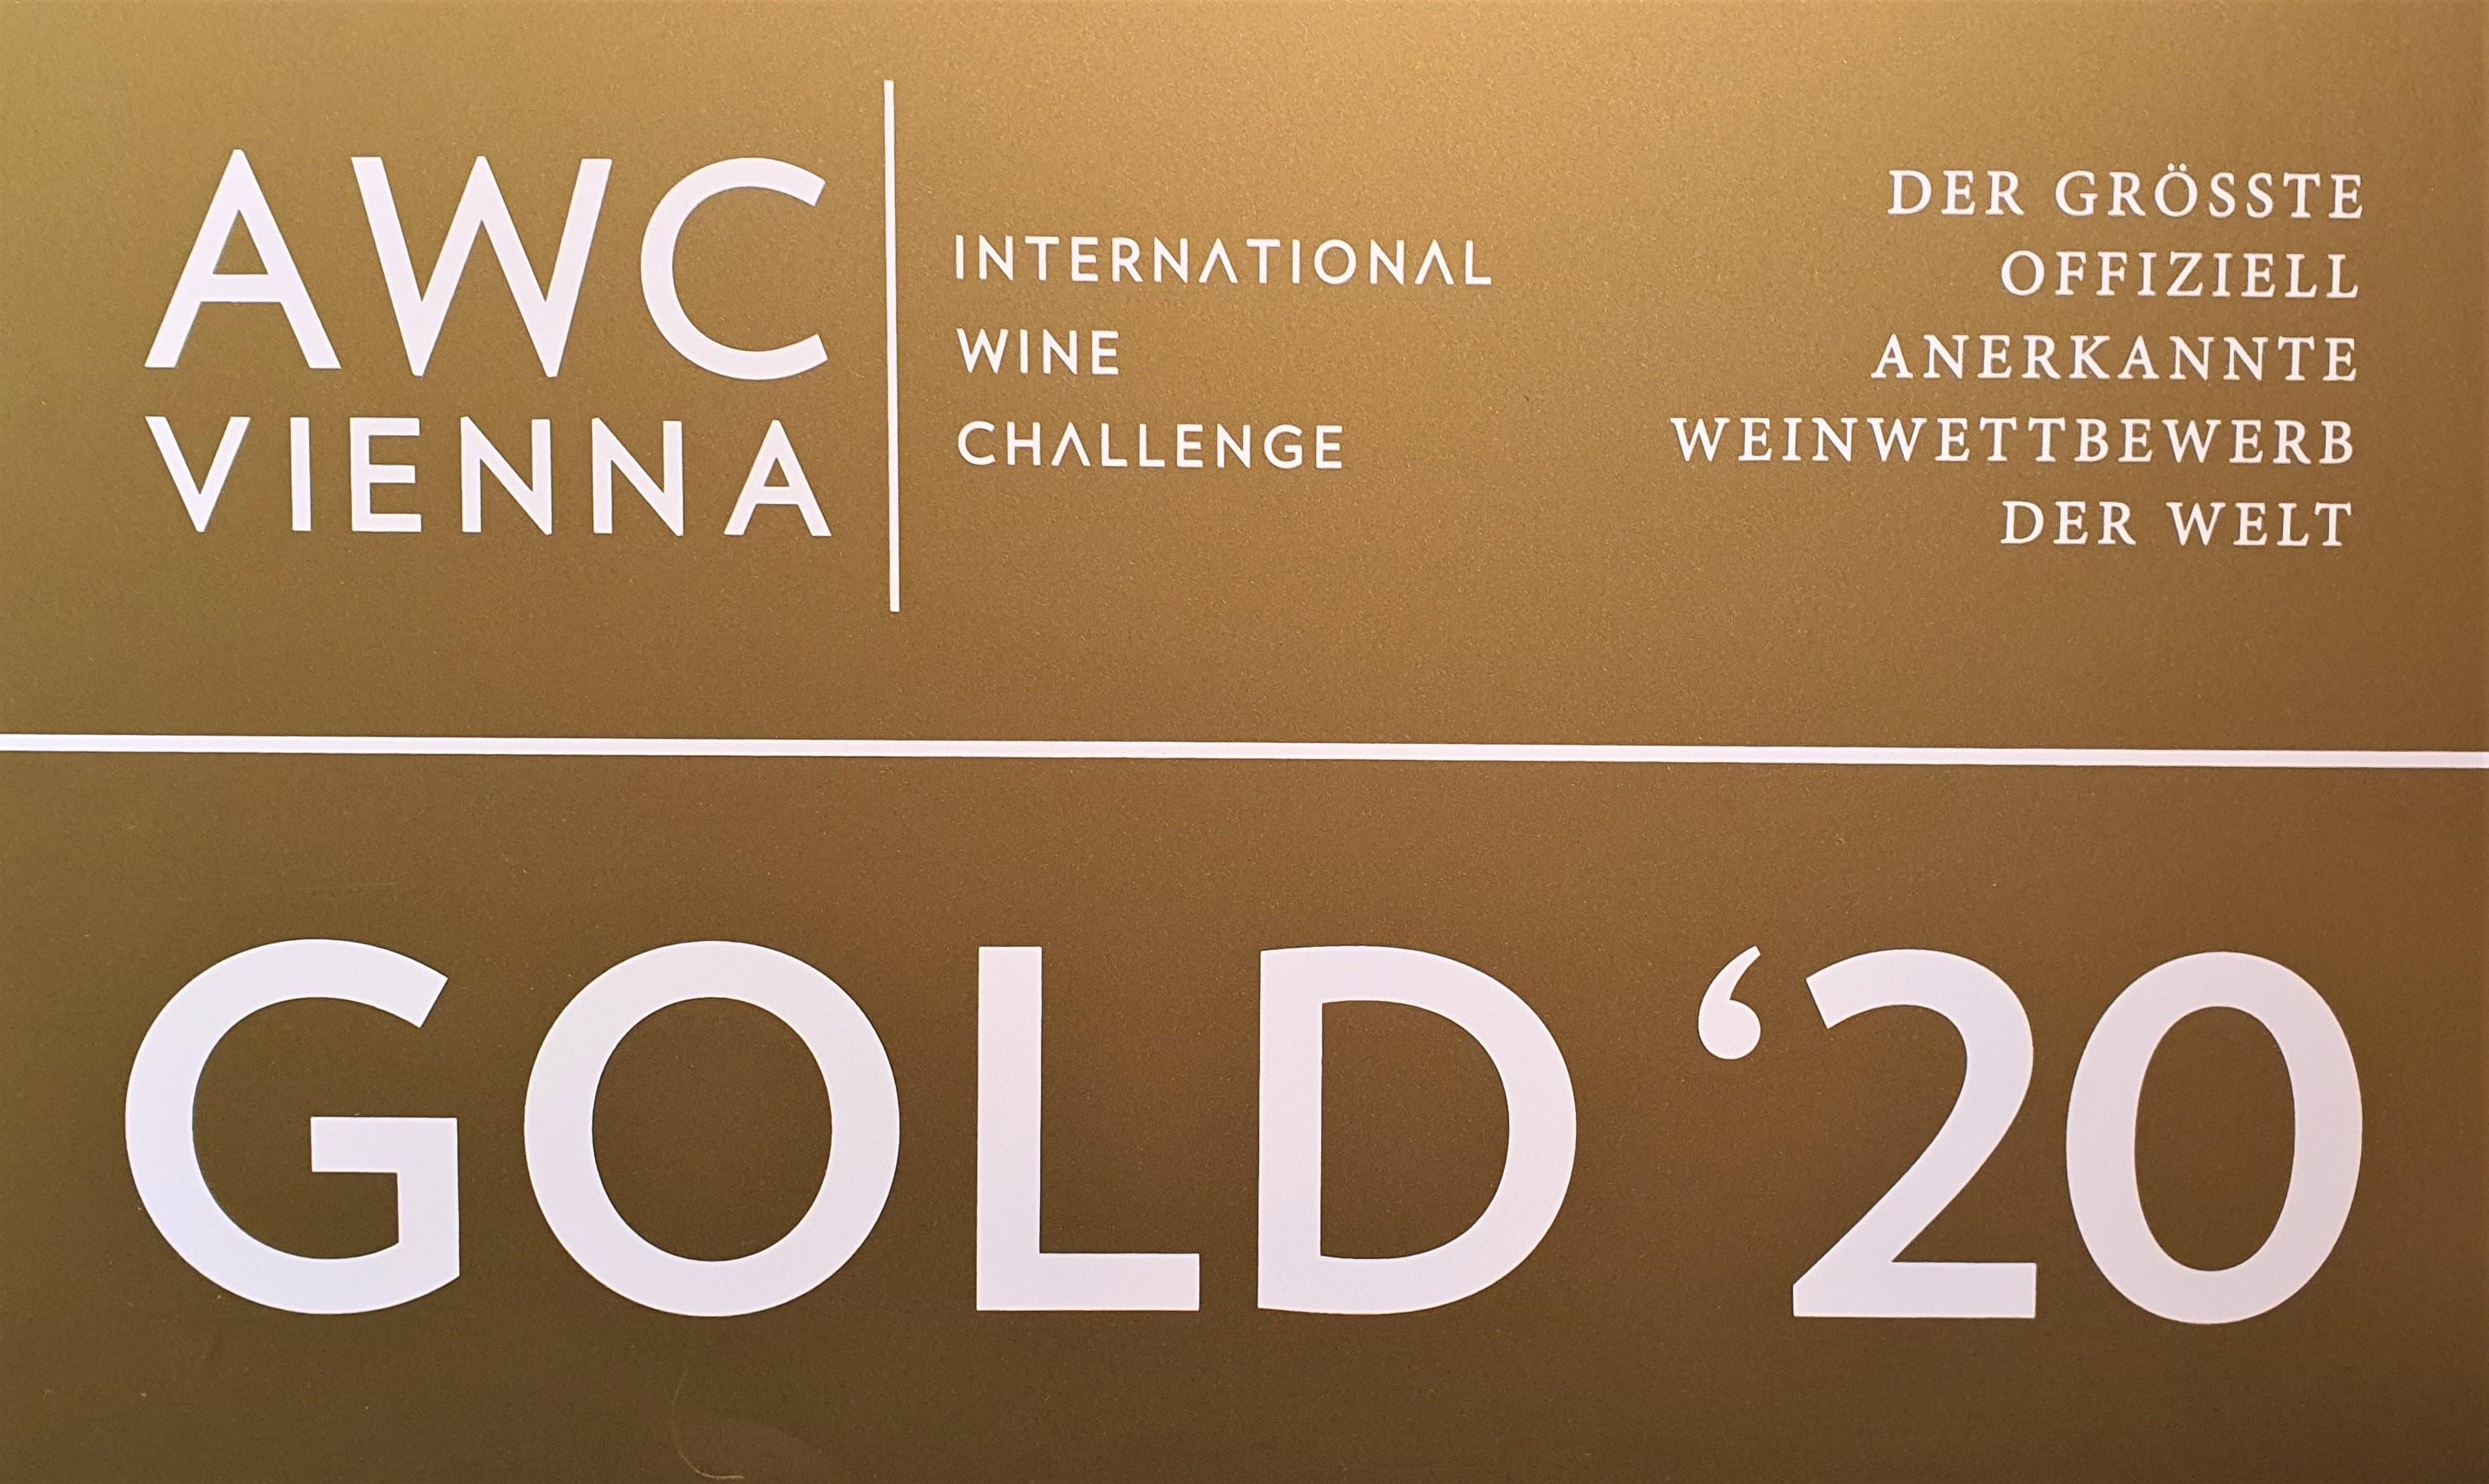 AWC Vienna 1